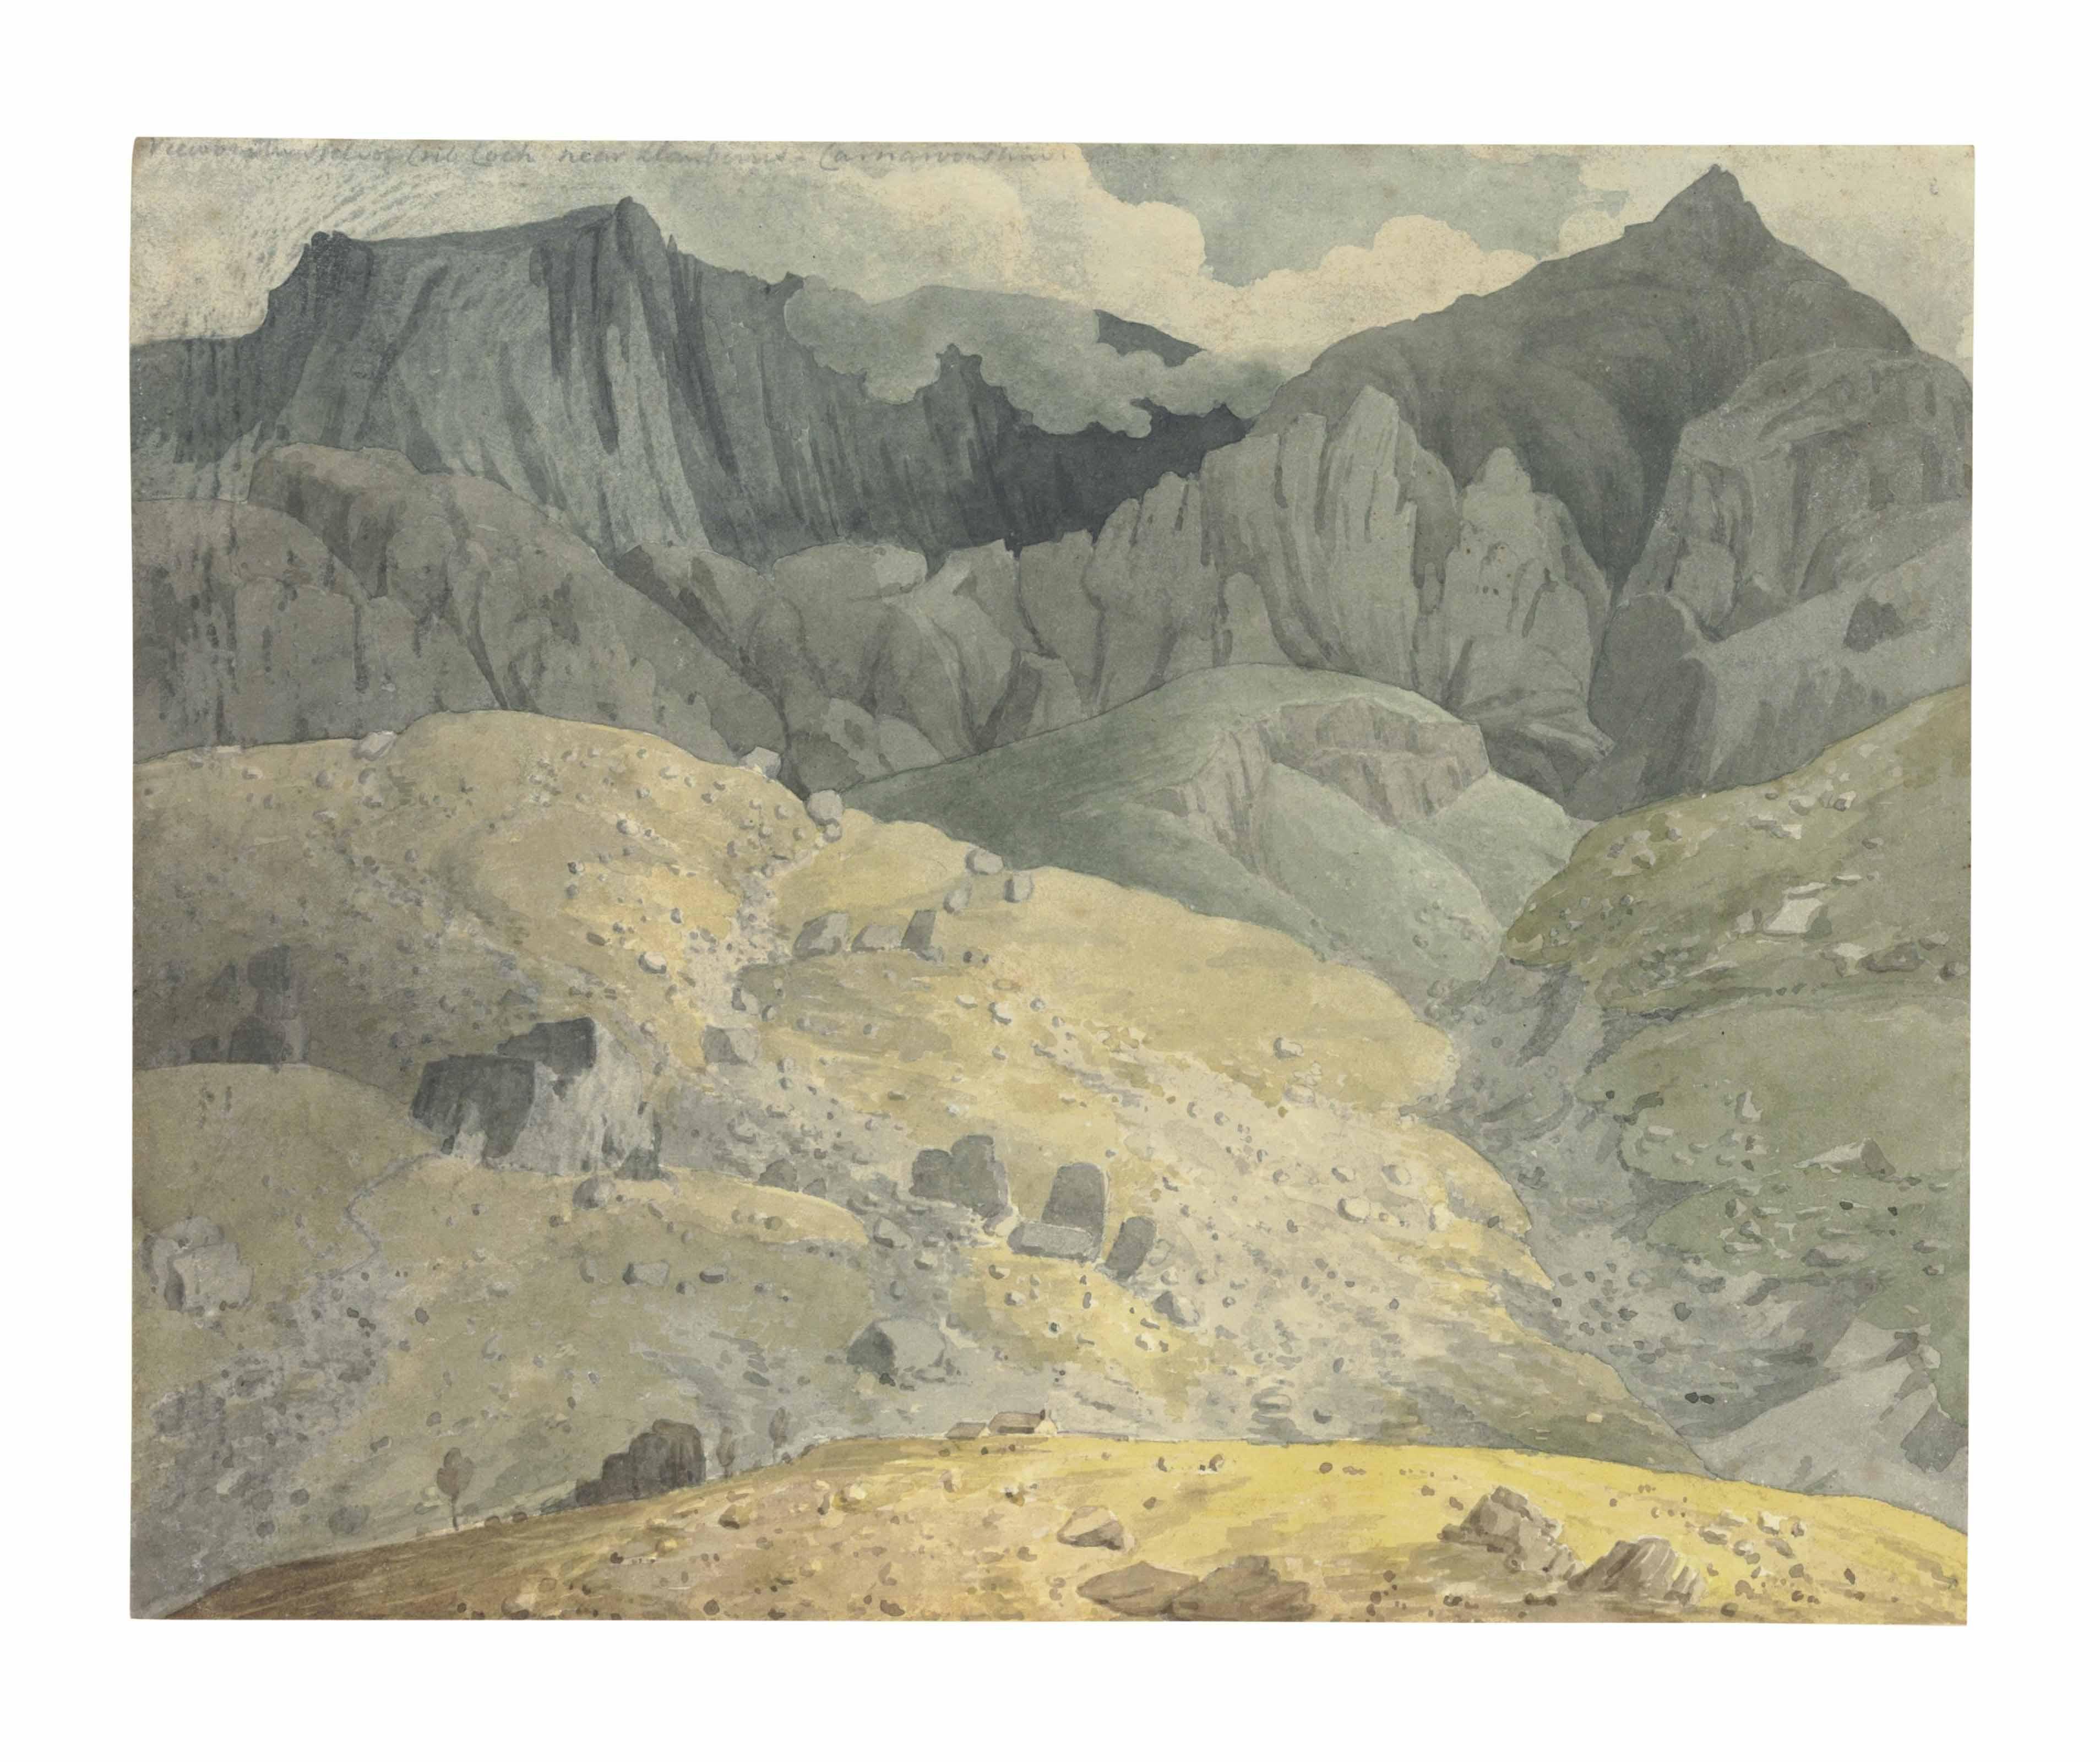 View of Mount Snowdon and Crib Goch, Caernarvonshire, North Wales